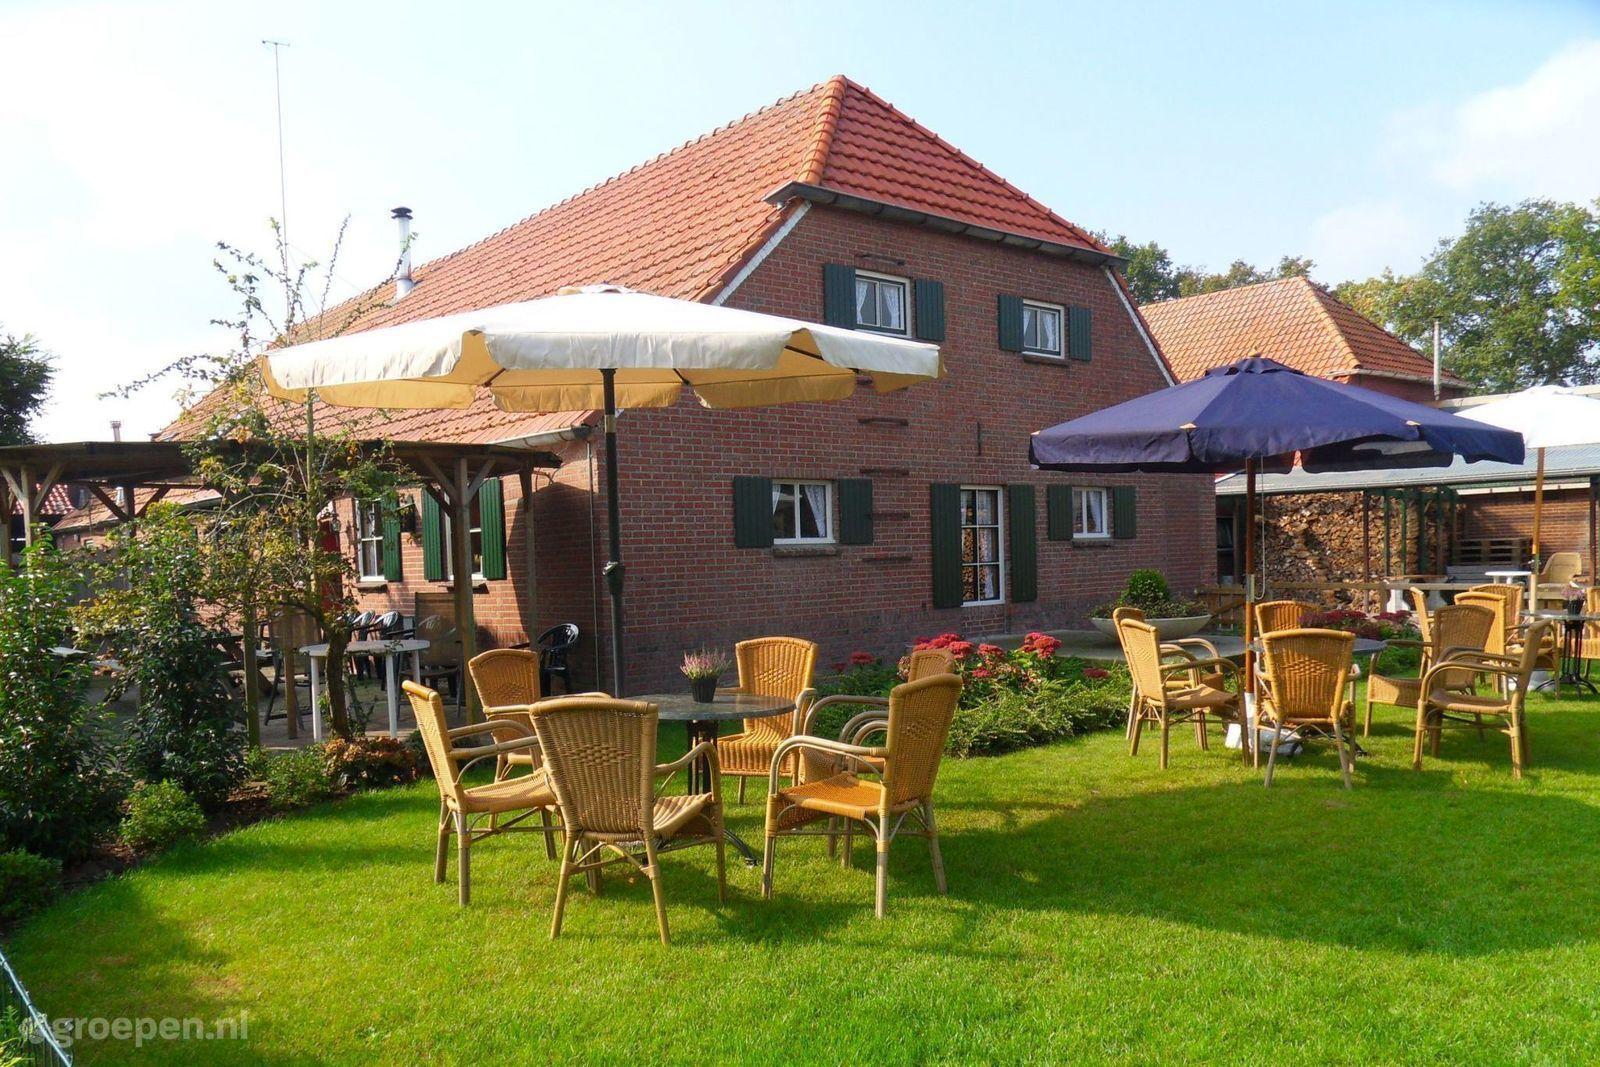 Vakantieboerderij Eibergen - 26 personen - Nederland - Gelderland - Eibergen